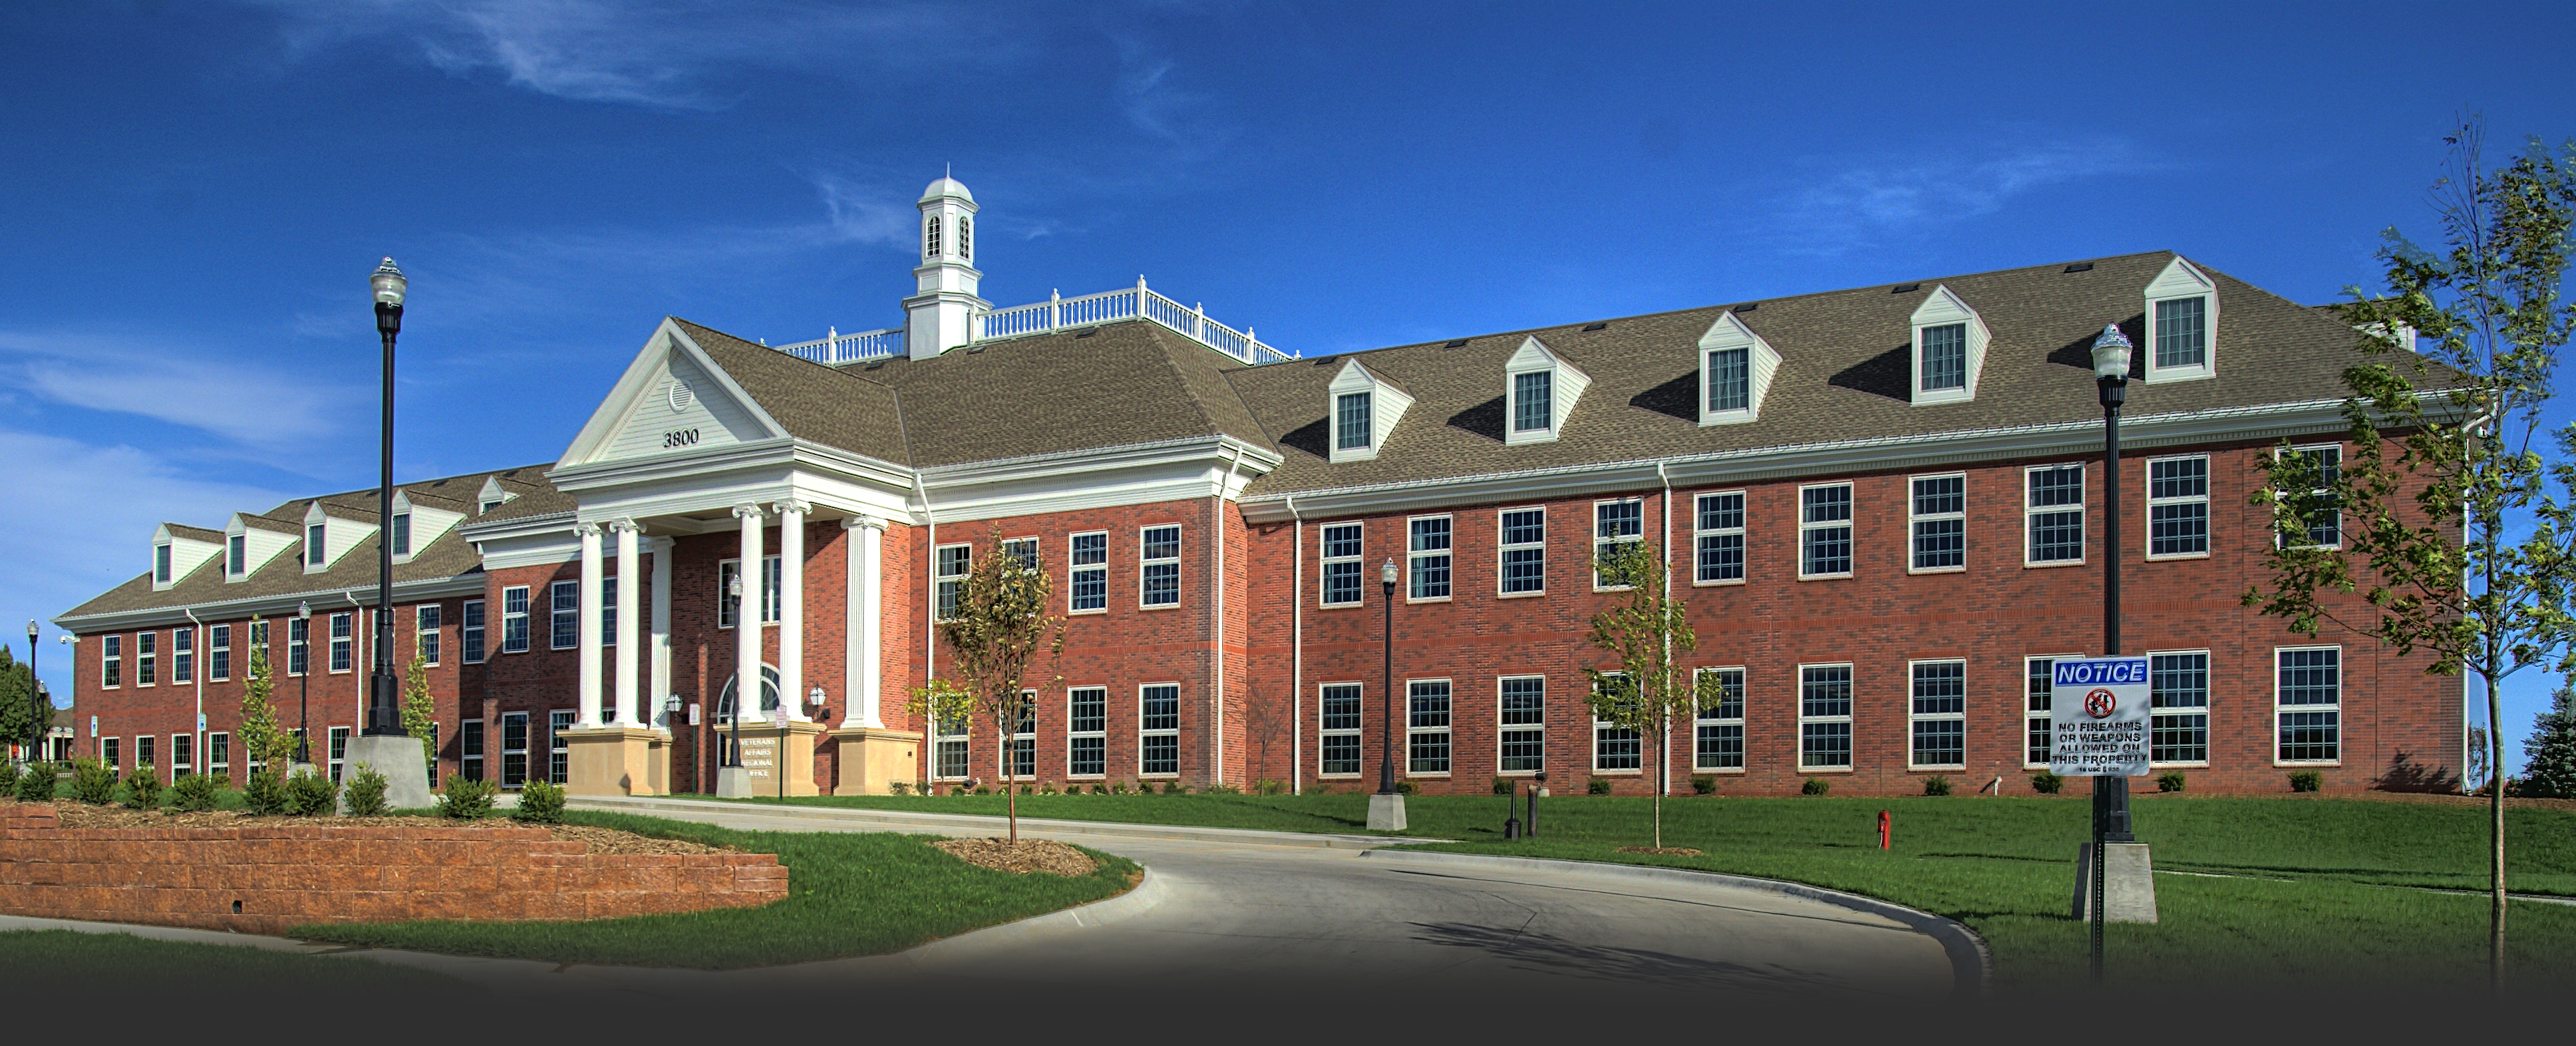 Veteran's Affairs Regional Office Building